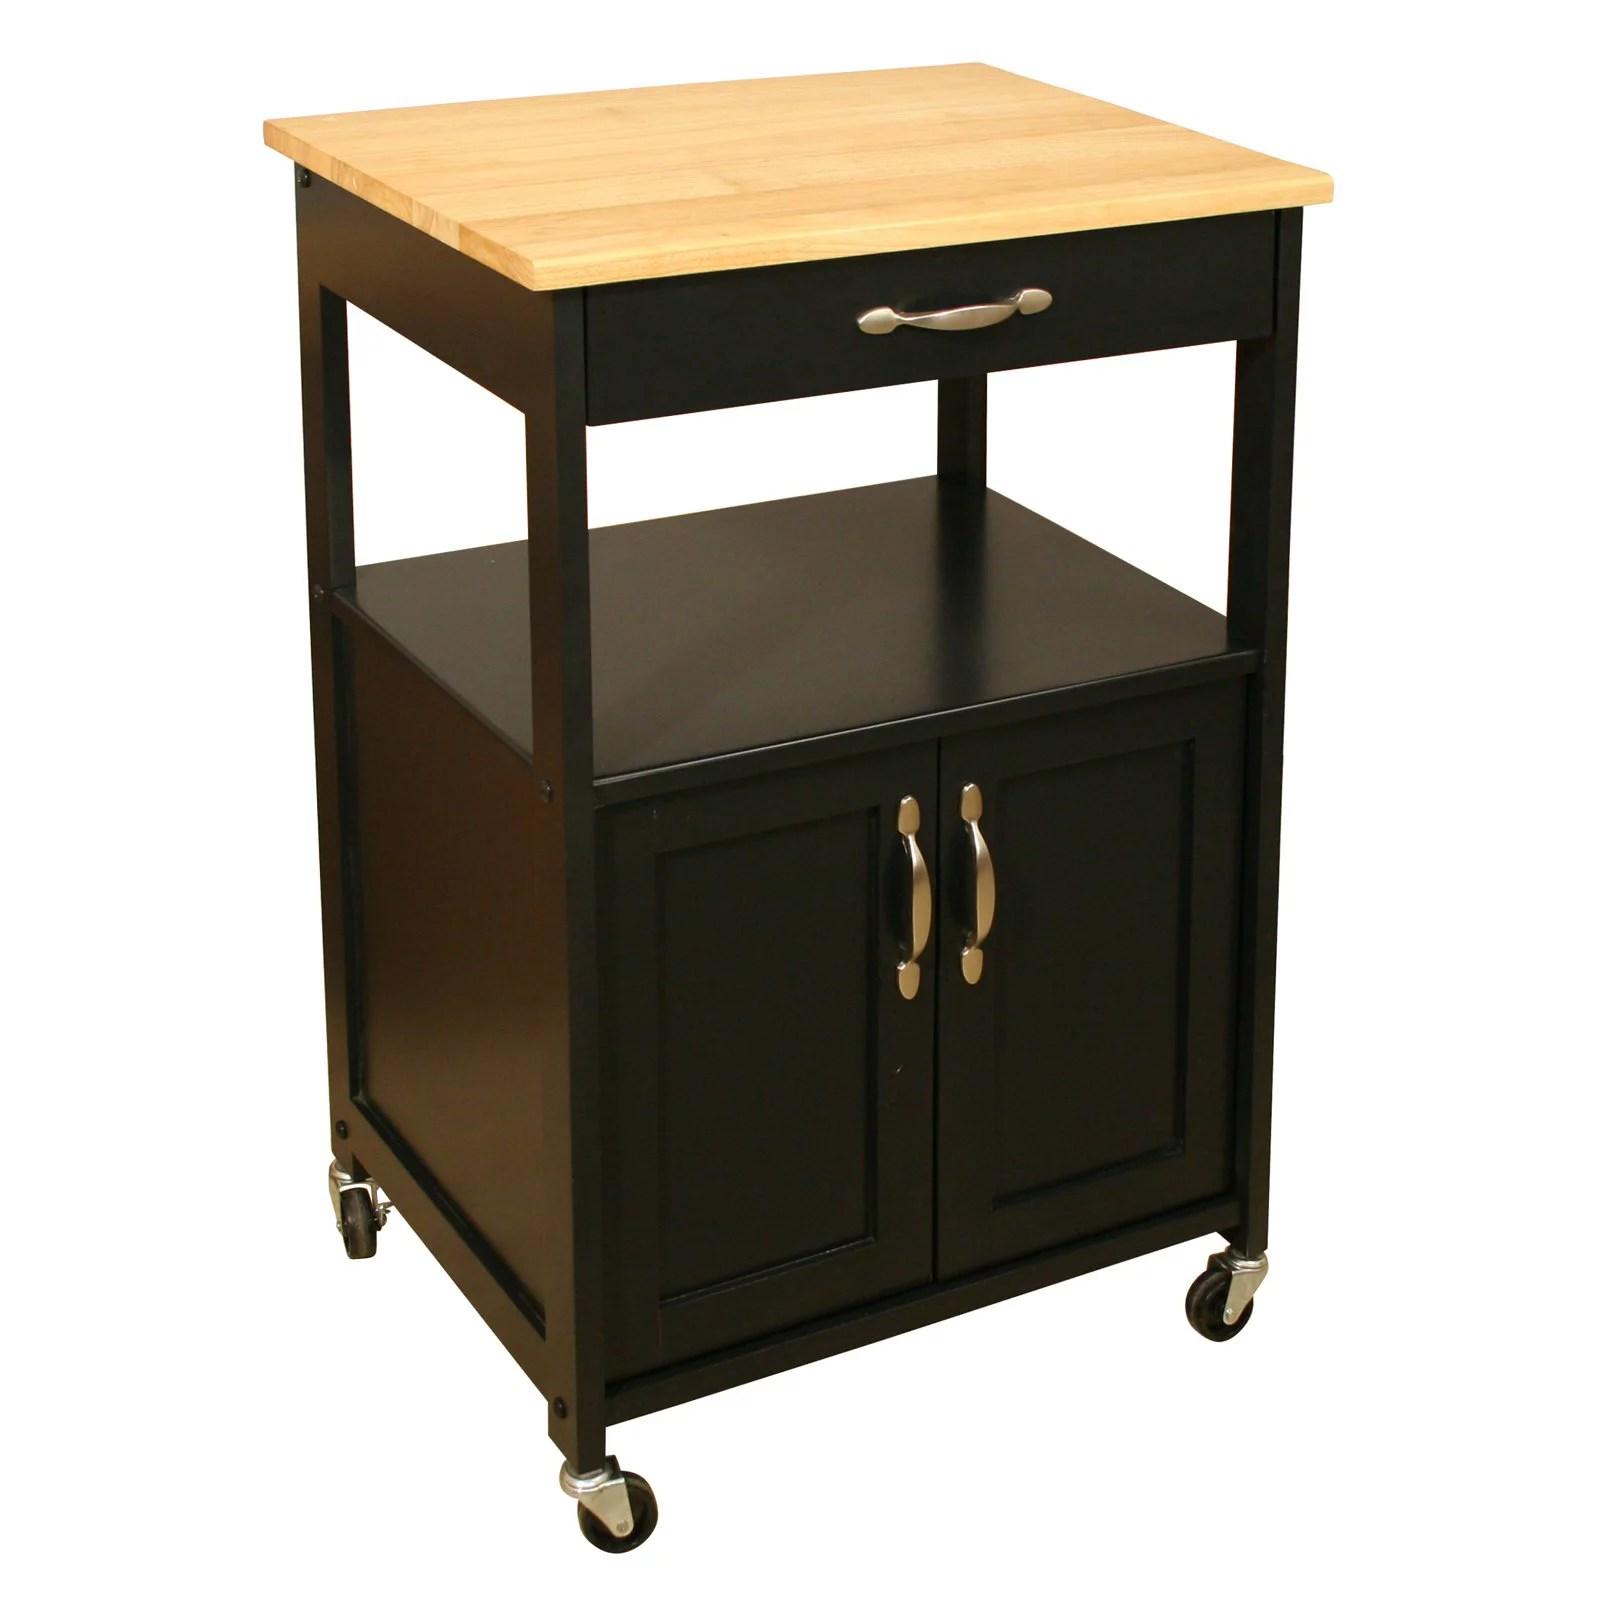 kitchen trolley cart ladder catskill craftsmen black walmart com